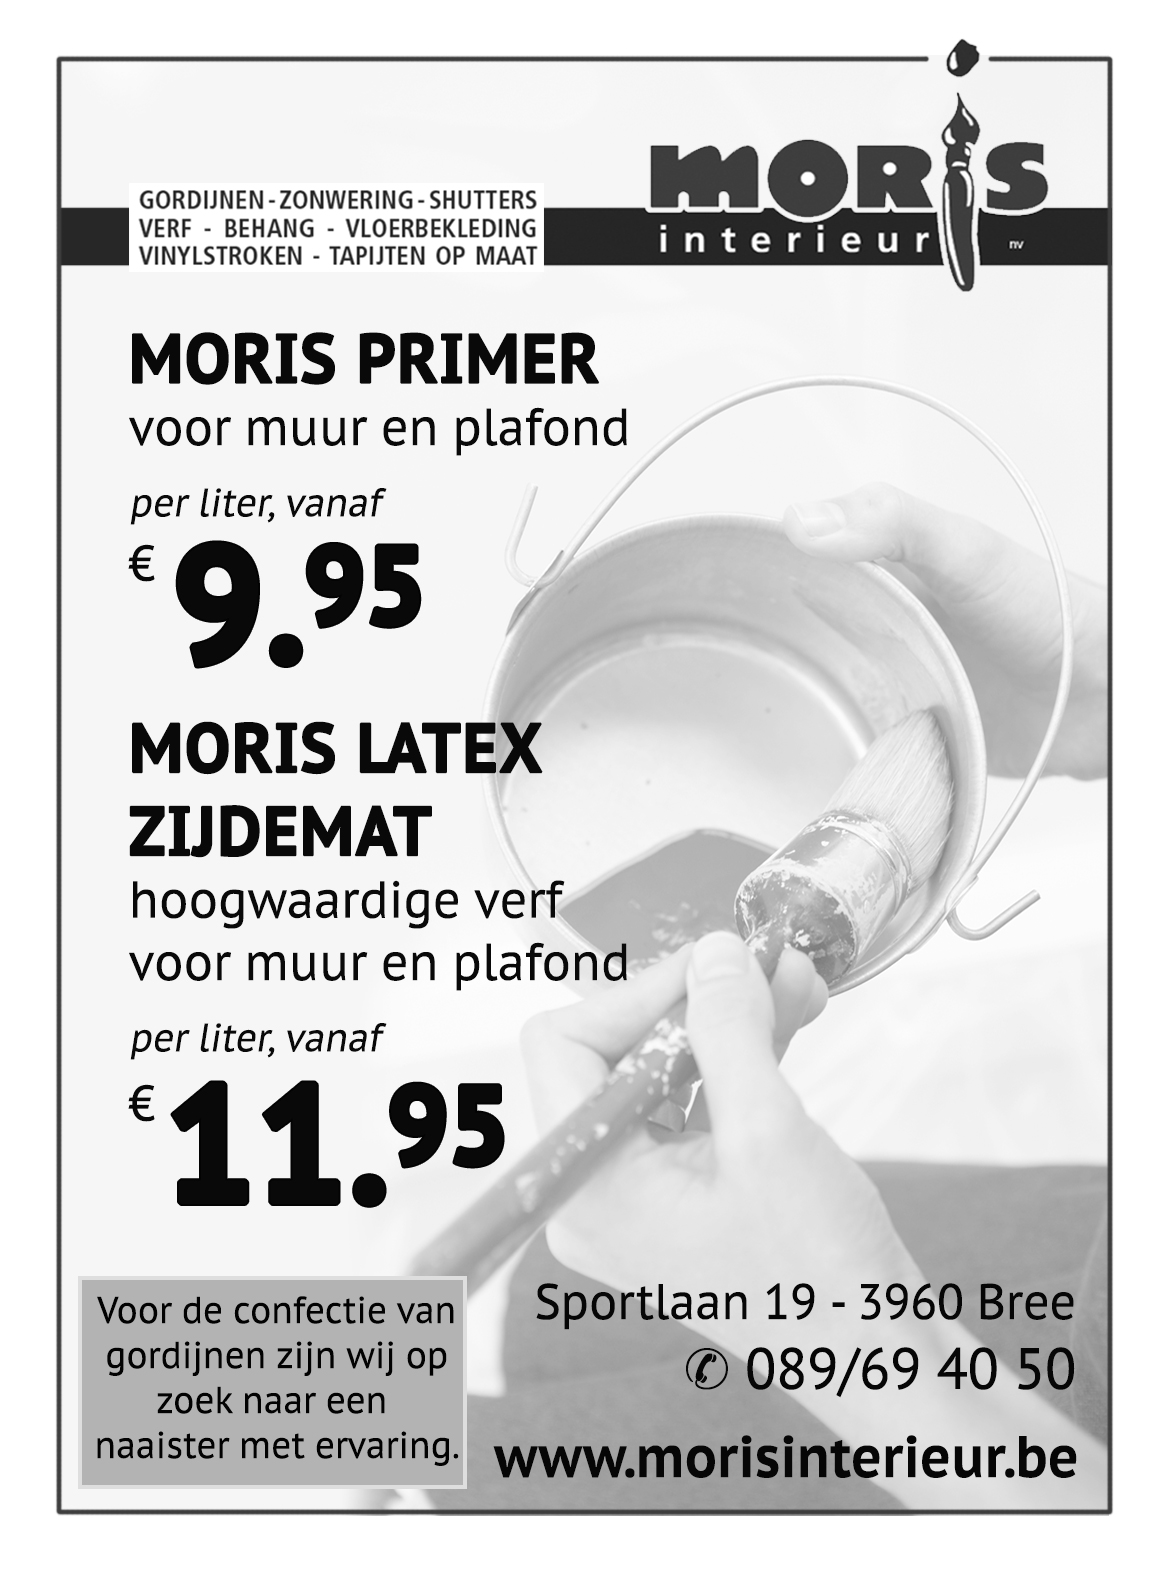 Moris Primer - Moris Latex zijdemat